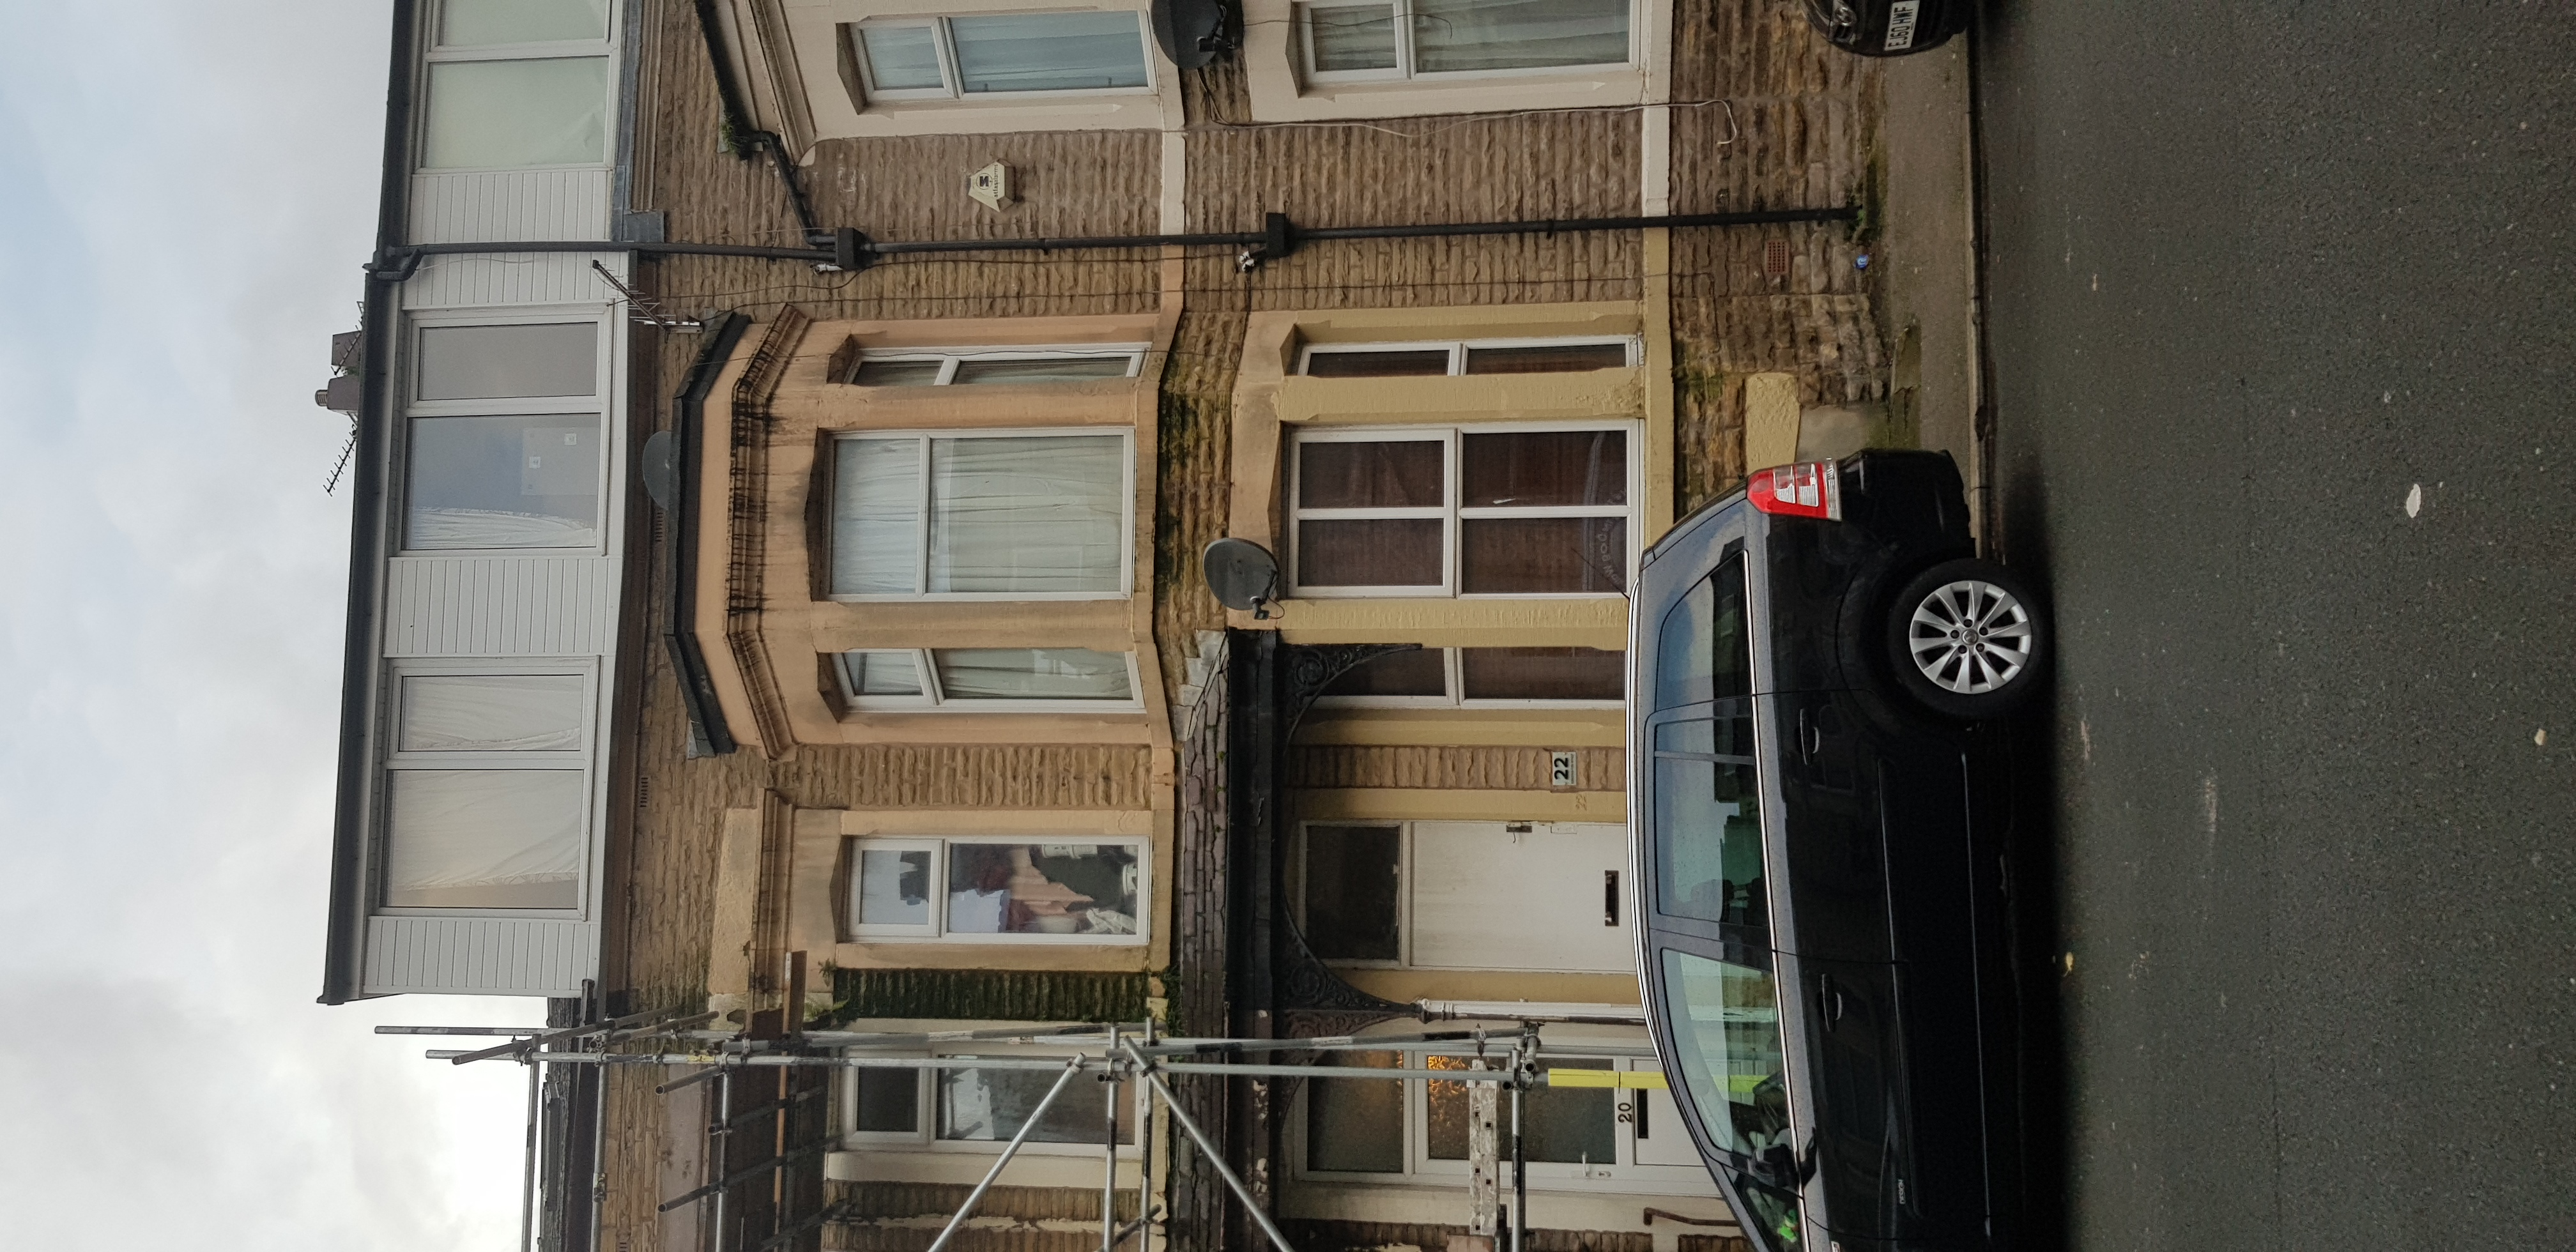 Flat 2, 22 Kensington Road, Morecambe, Lancashire, LA4 5LX image